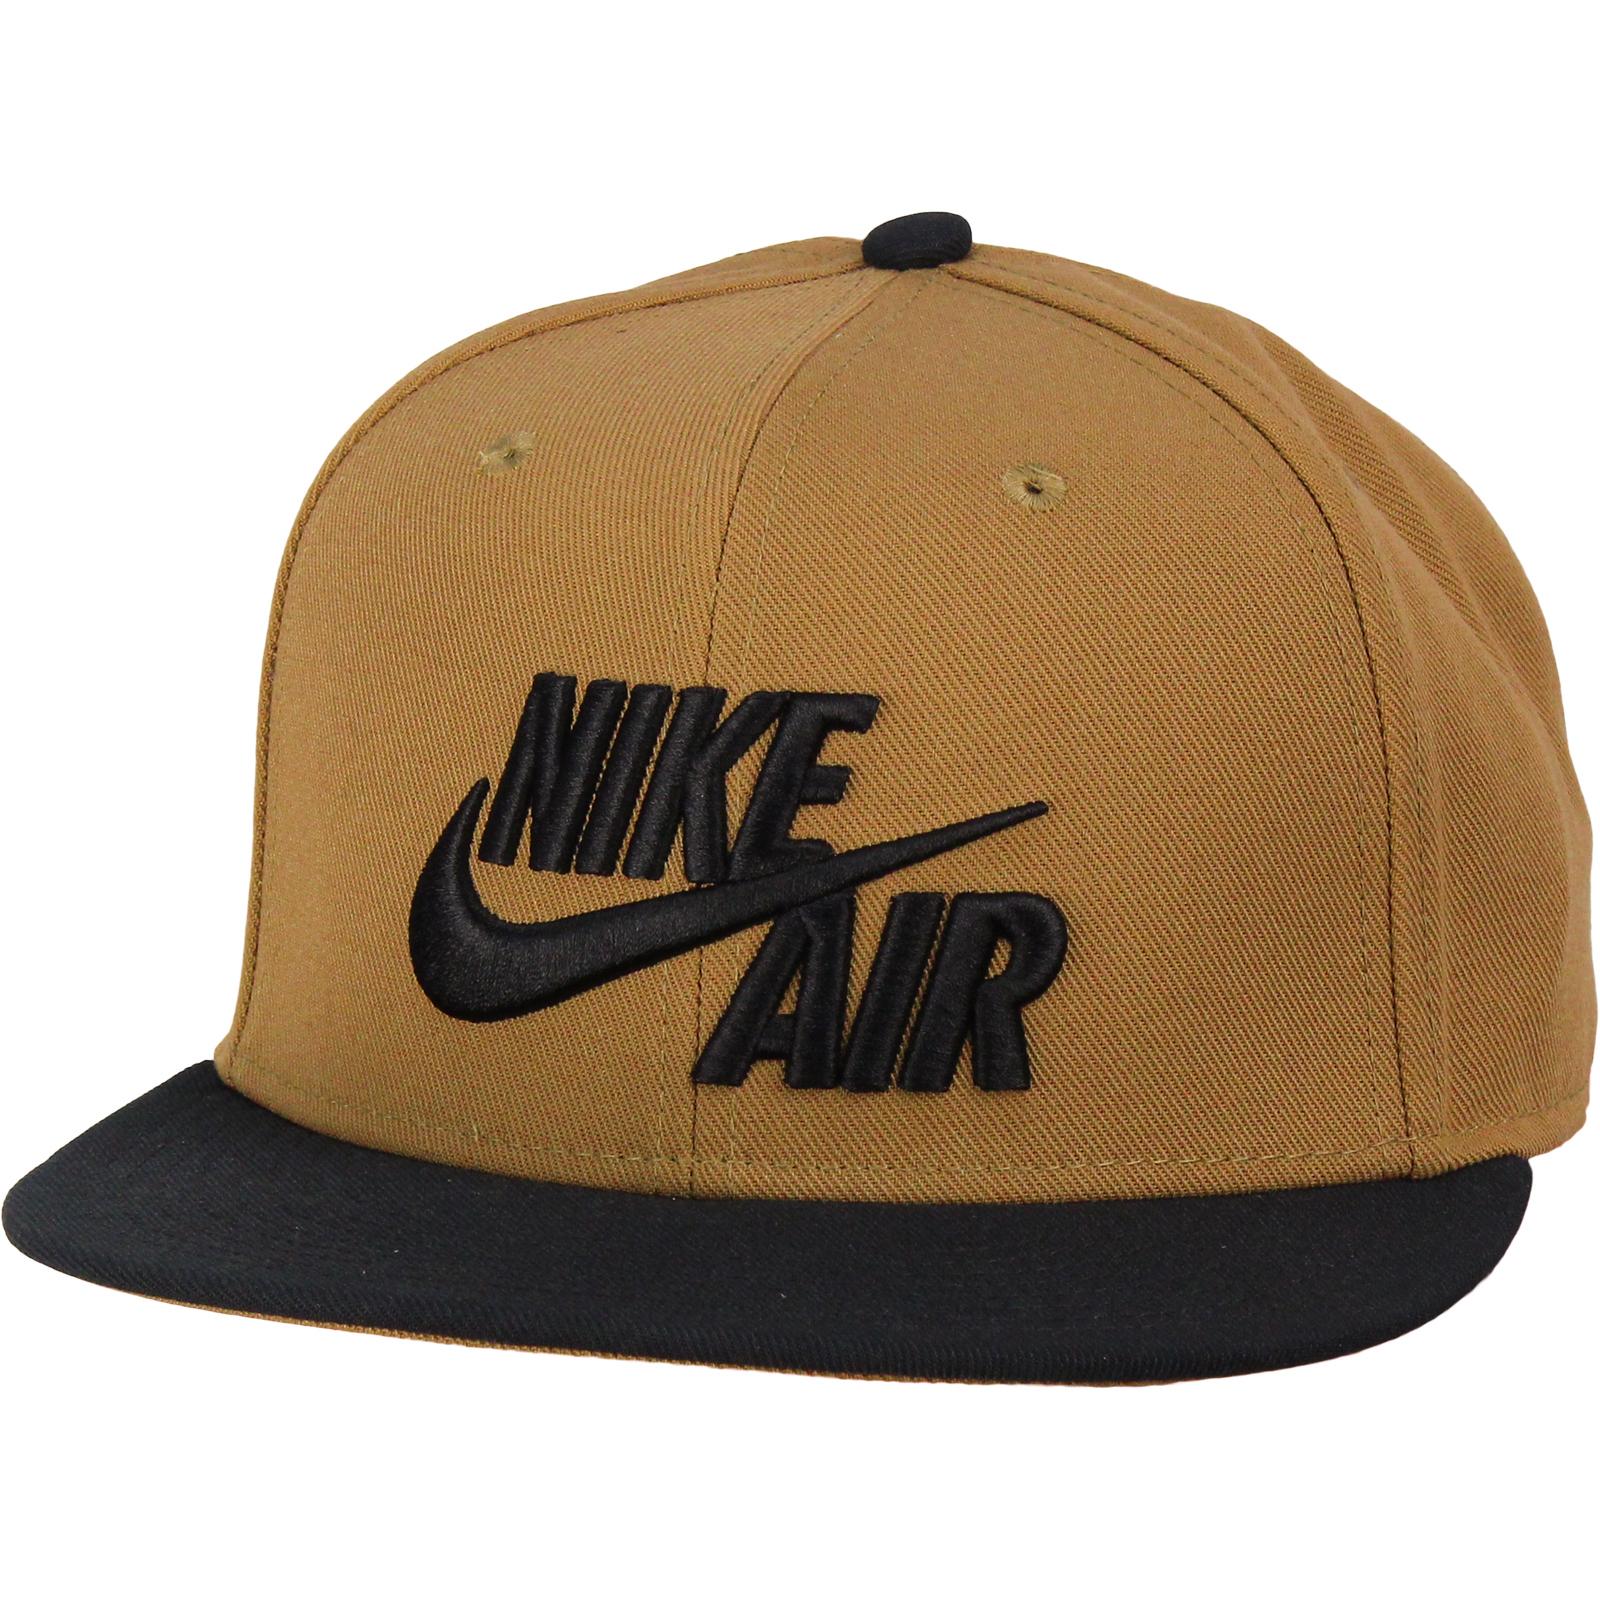 d7482ee52 Šiltovka Nike Air True Cap - 805063-245 | Shopline.sk